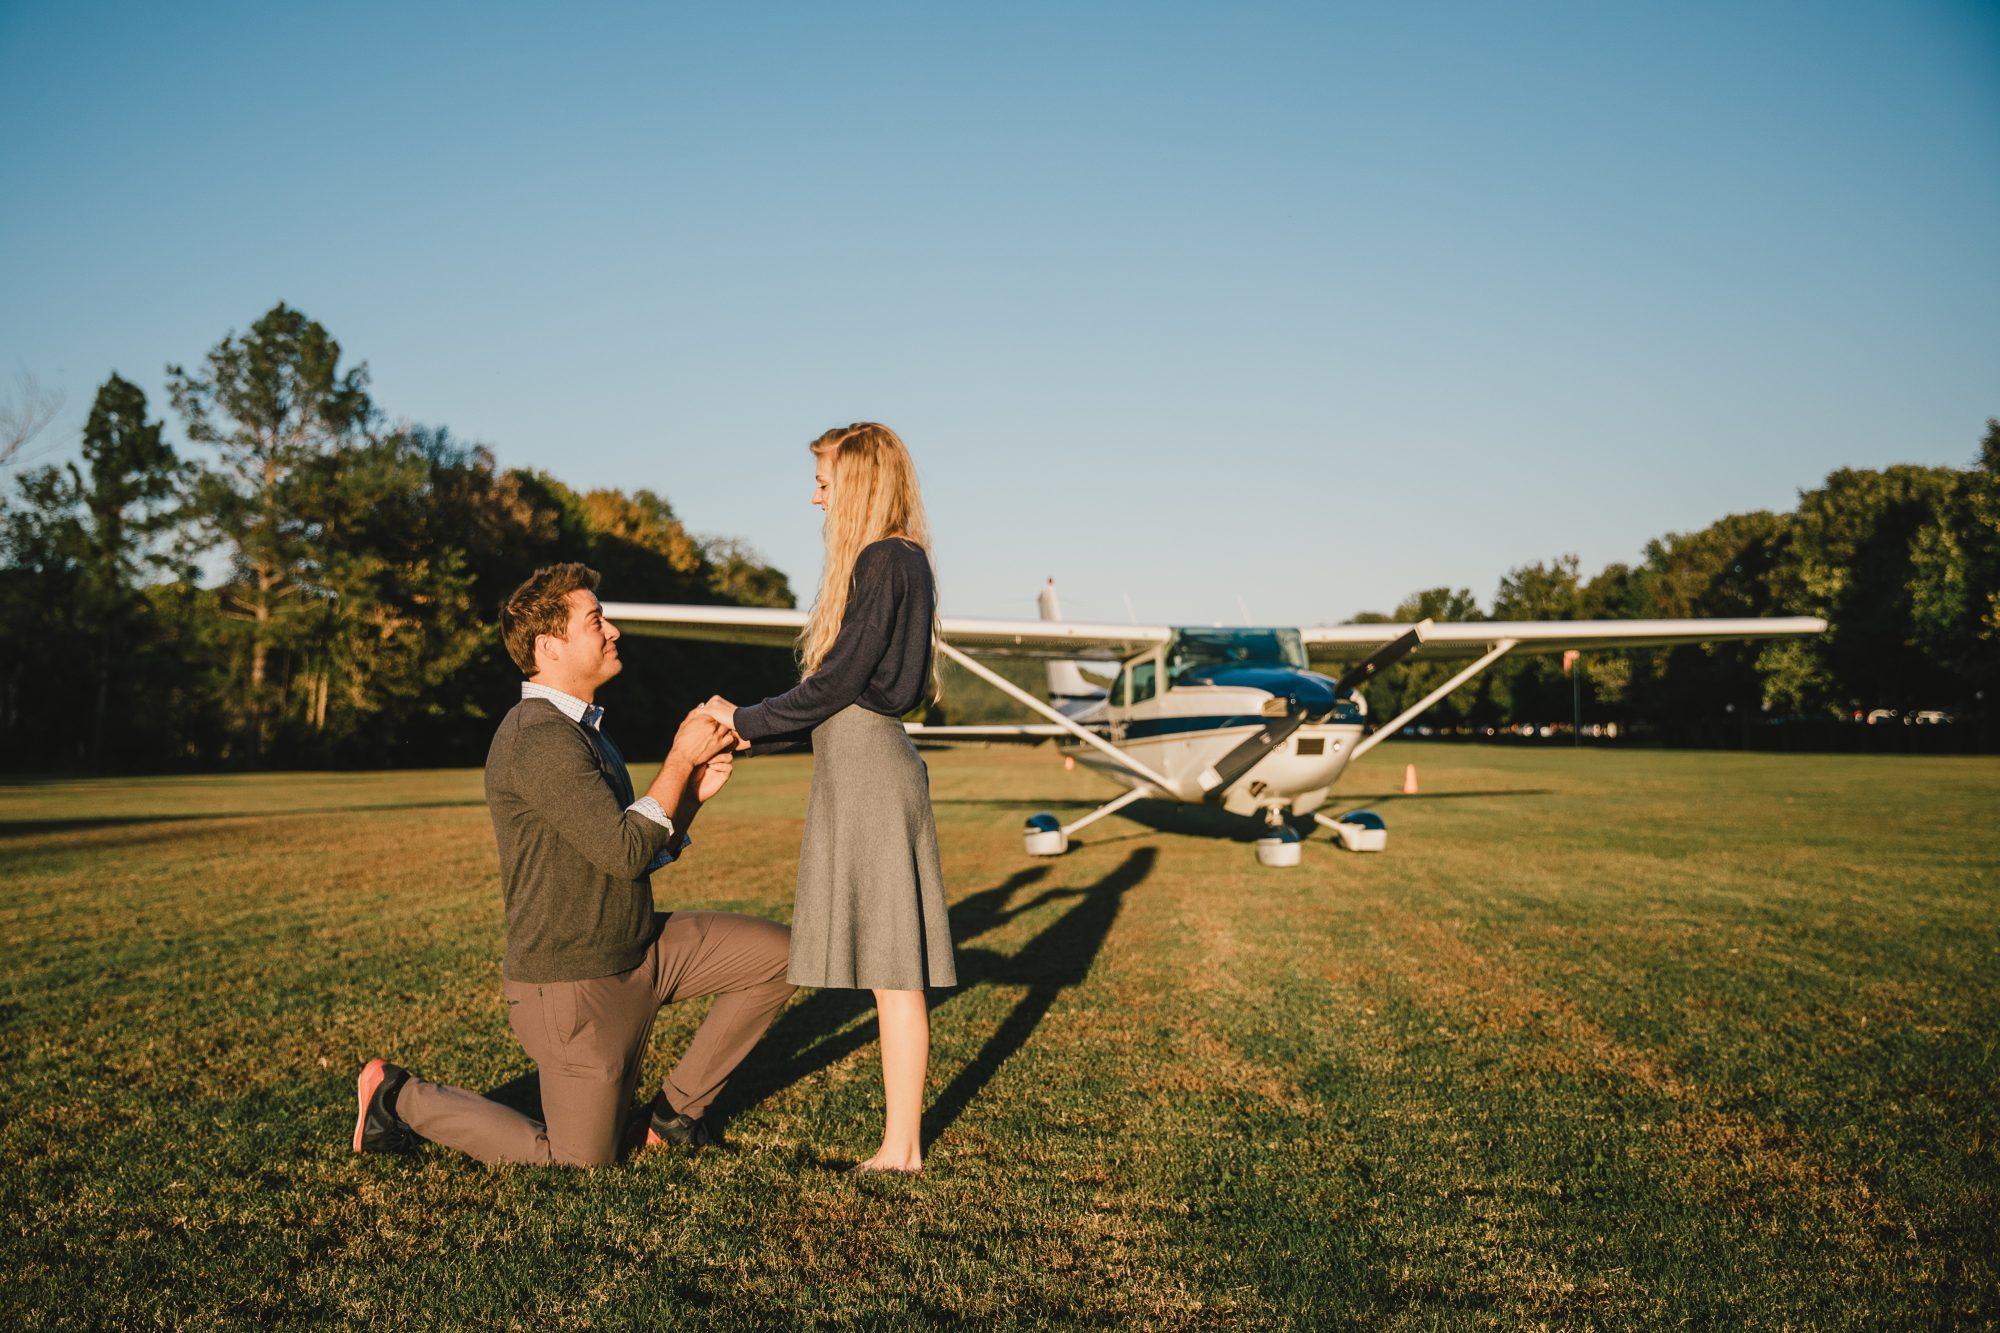 Ellen Petersen and Michael Haygood Celebrate Engagement